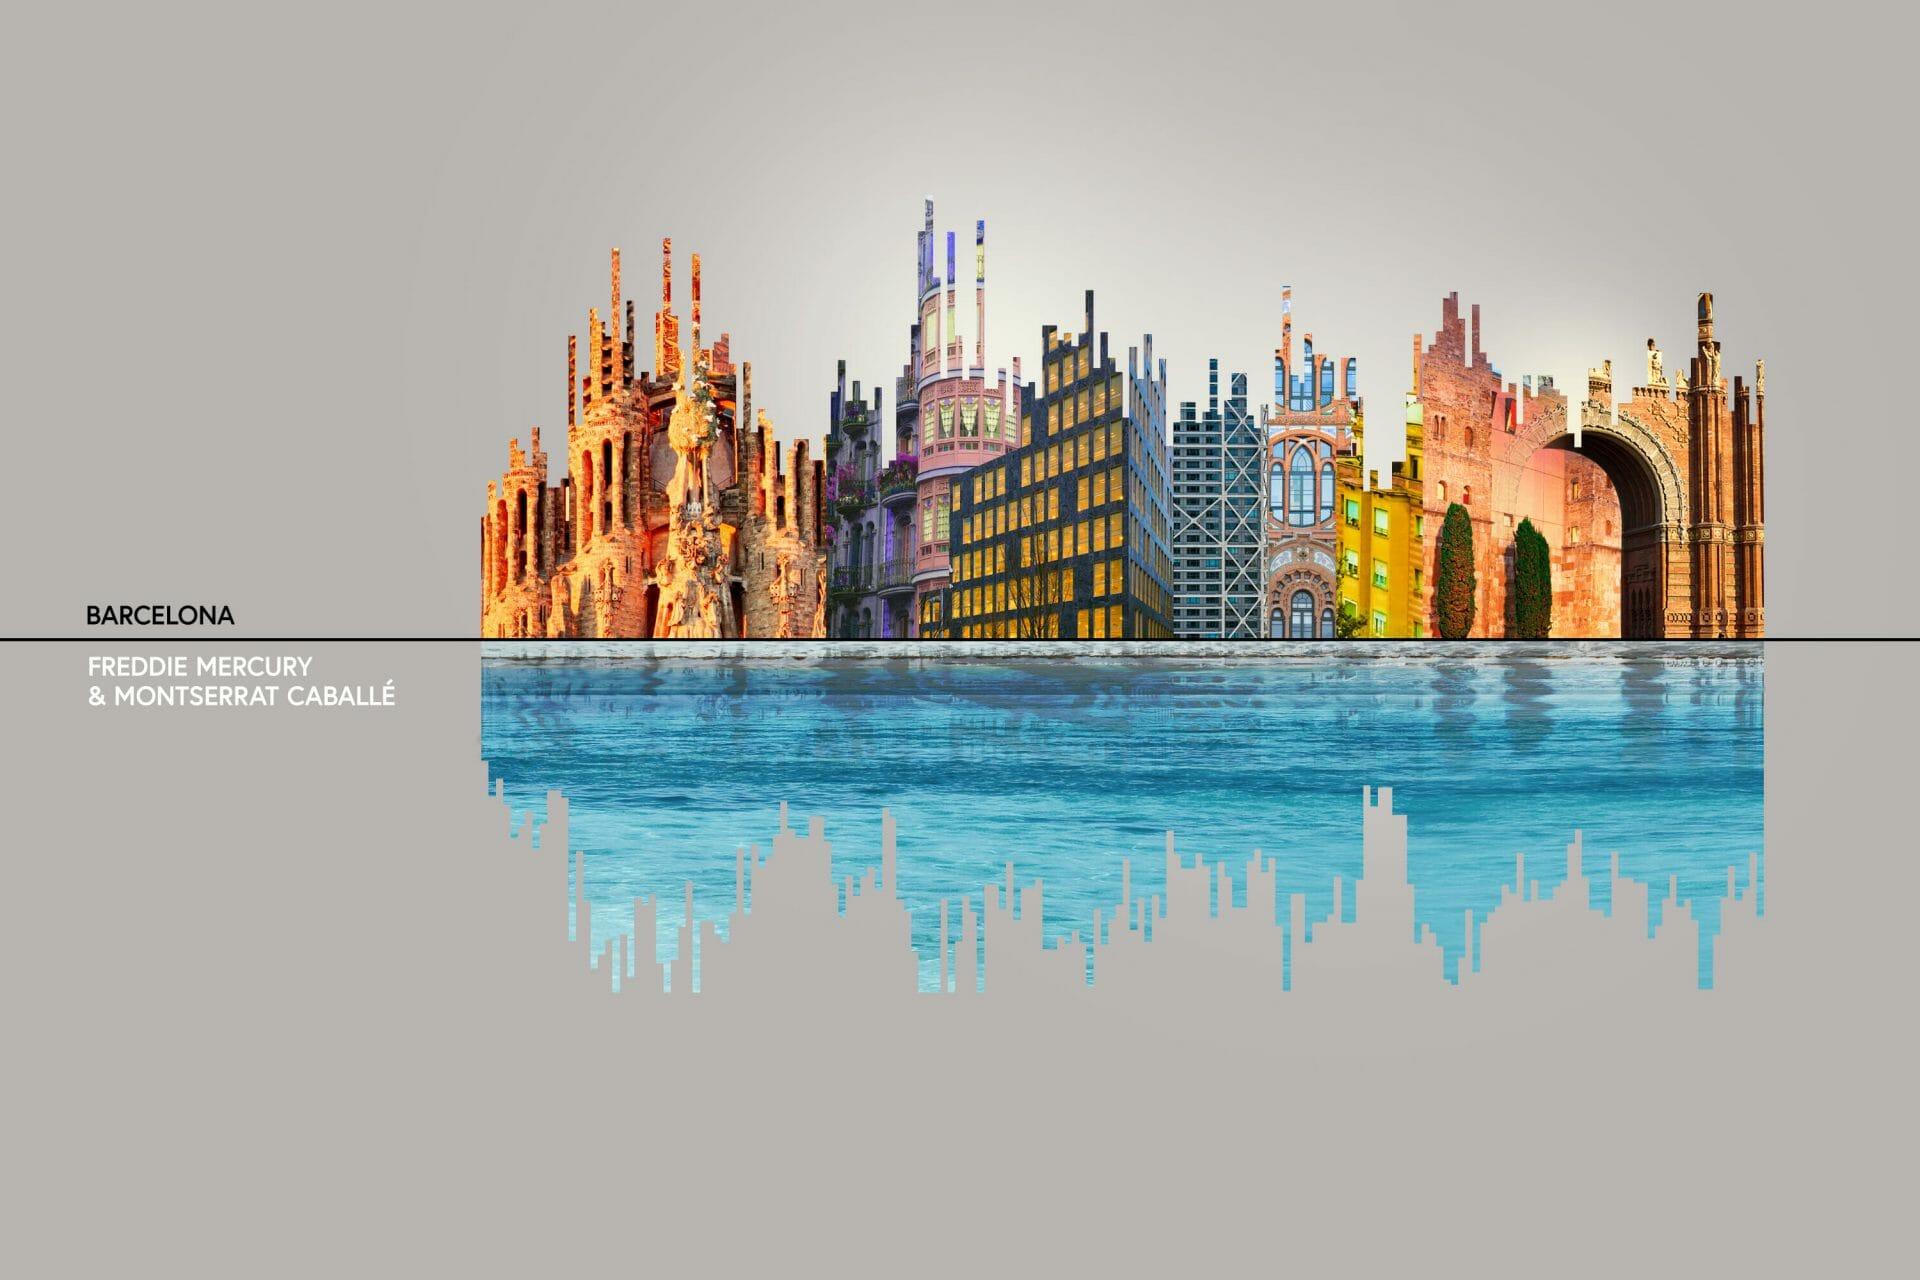 Barcelona waveform